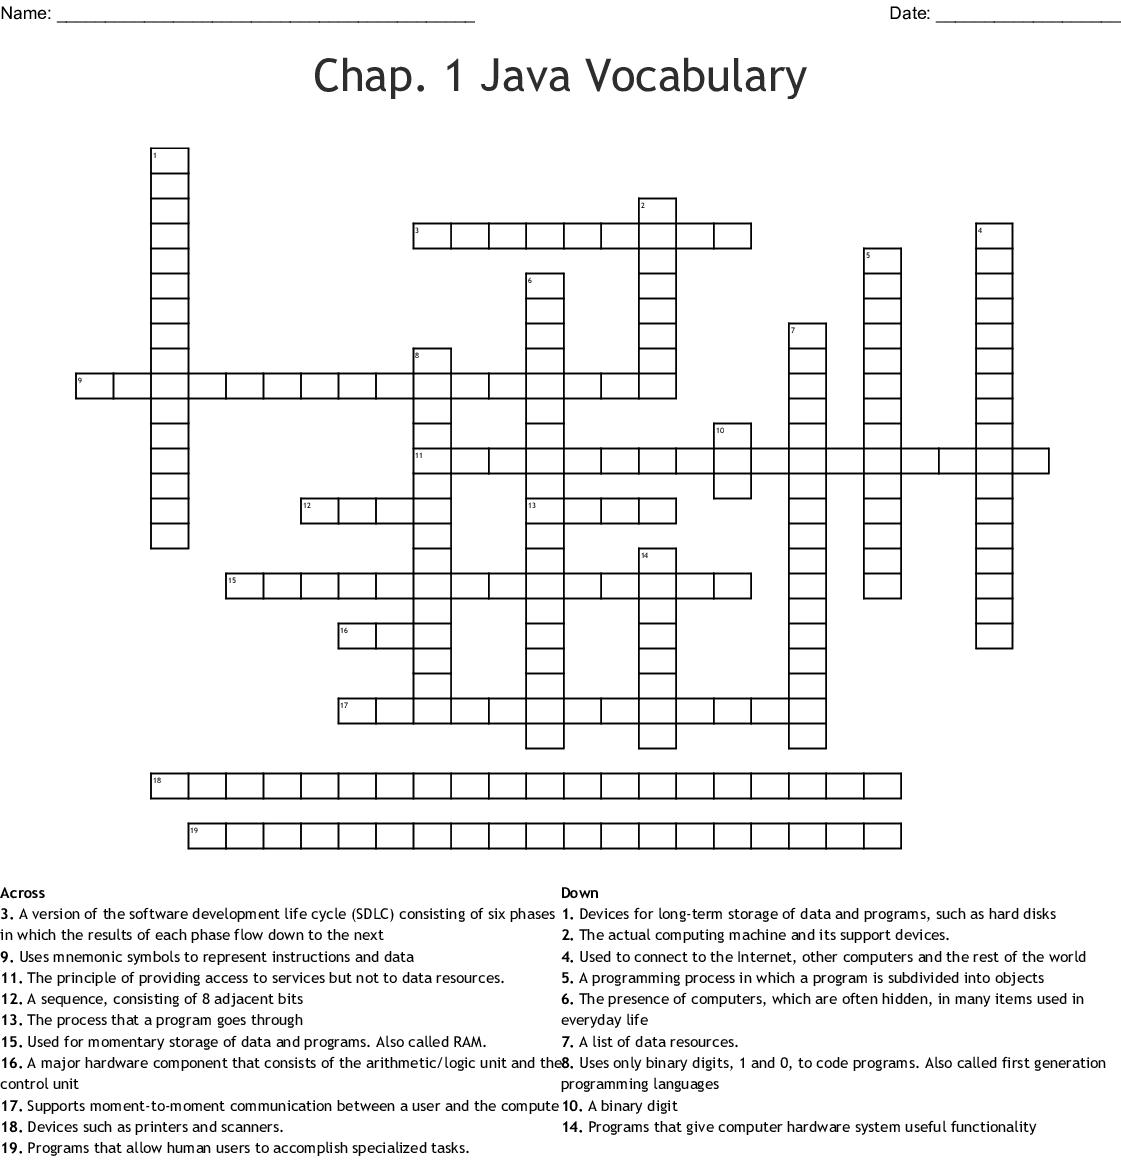 Chap 1 Java Vocabulary Crossword